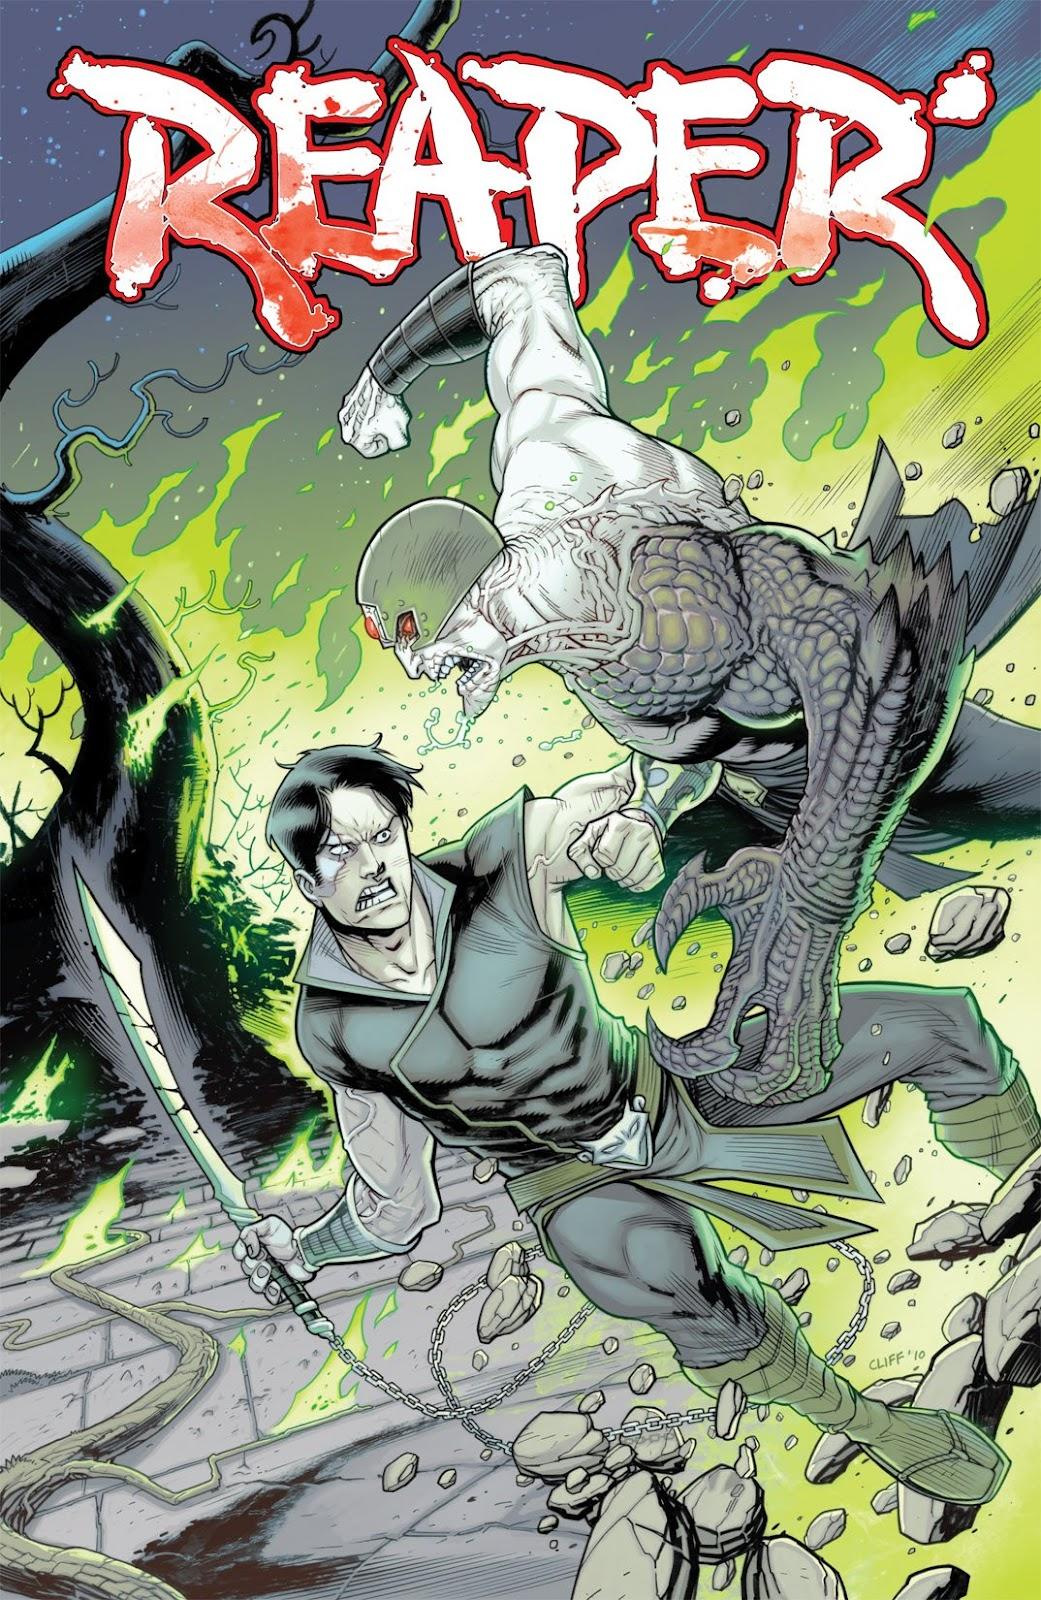 Read online Reaper comic -  Issue #2 - 35